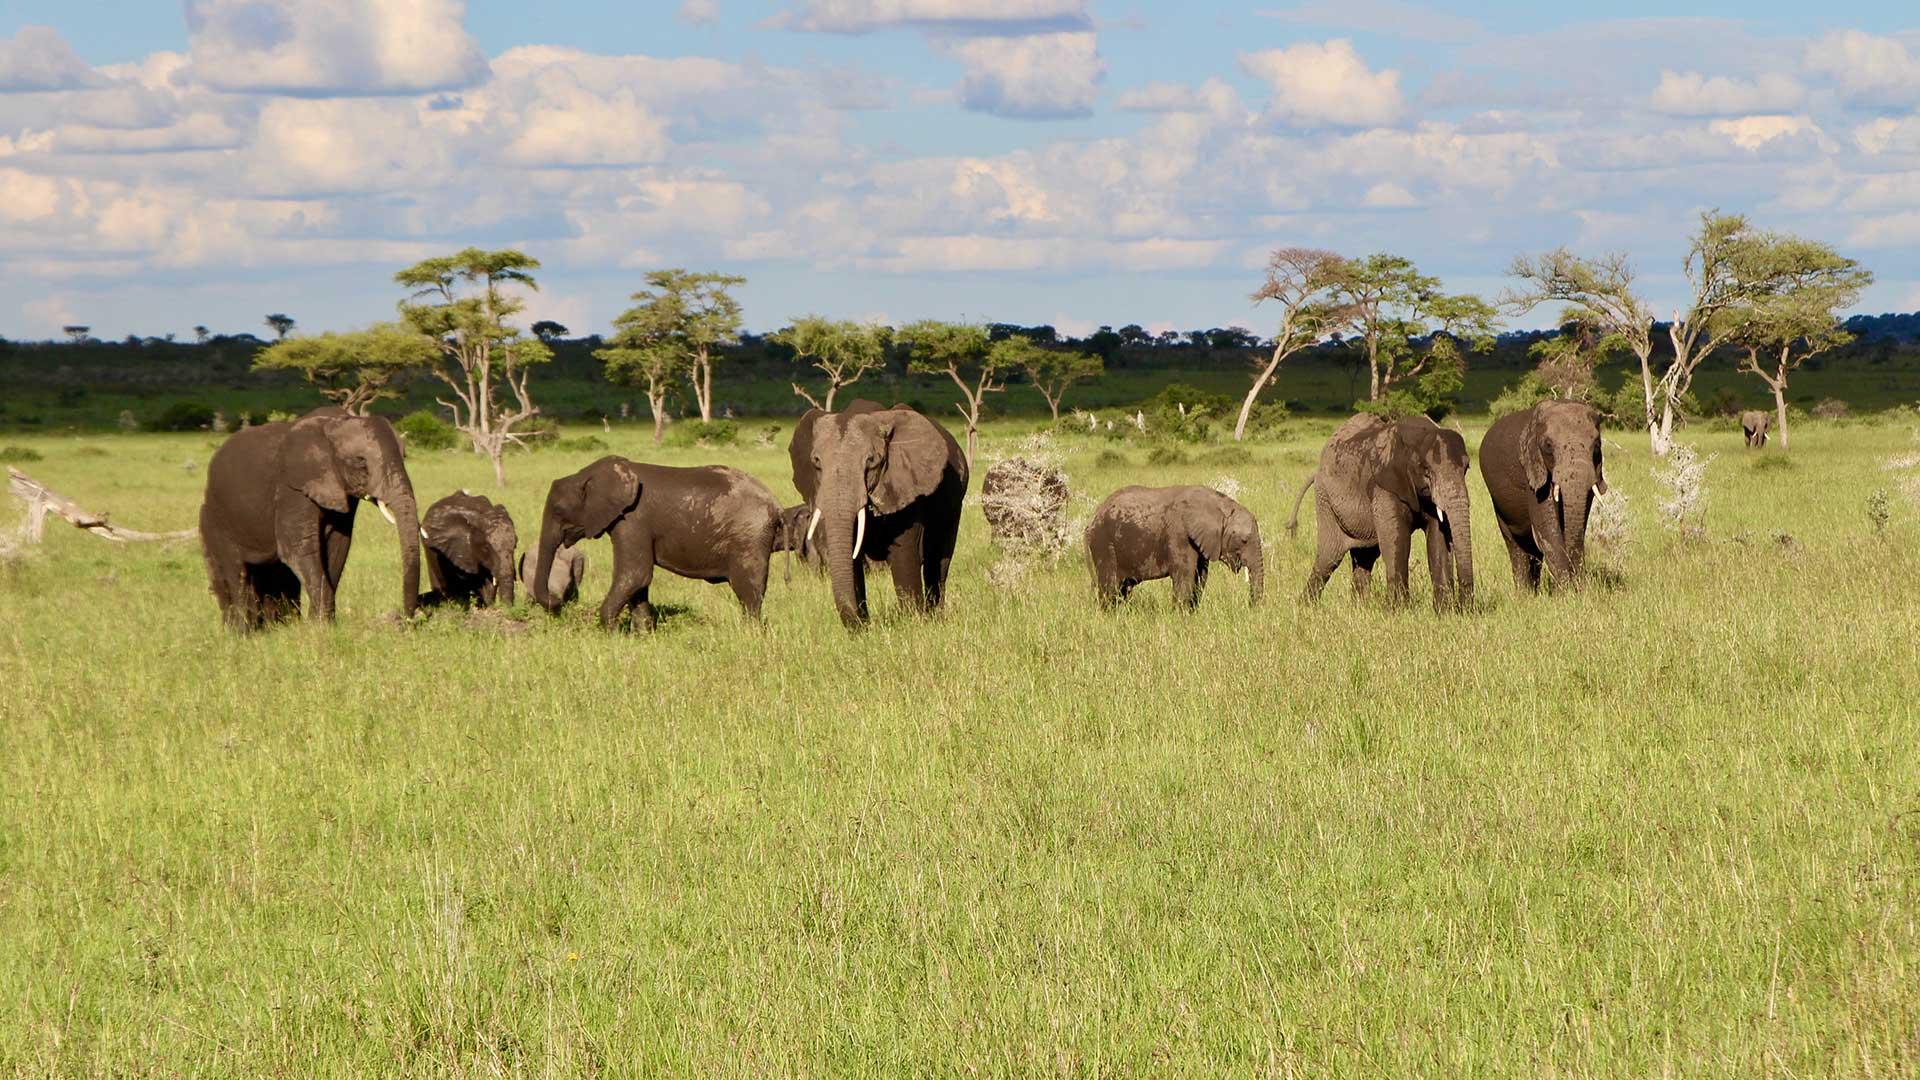 Singita elephants, Tanzania.